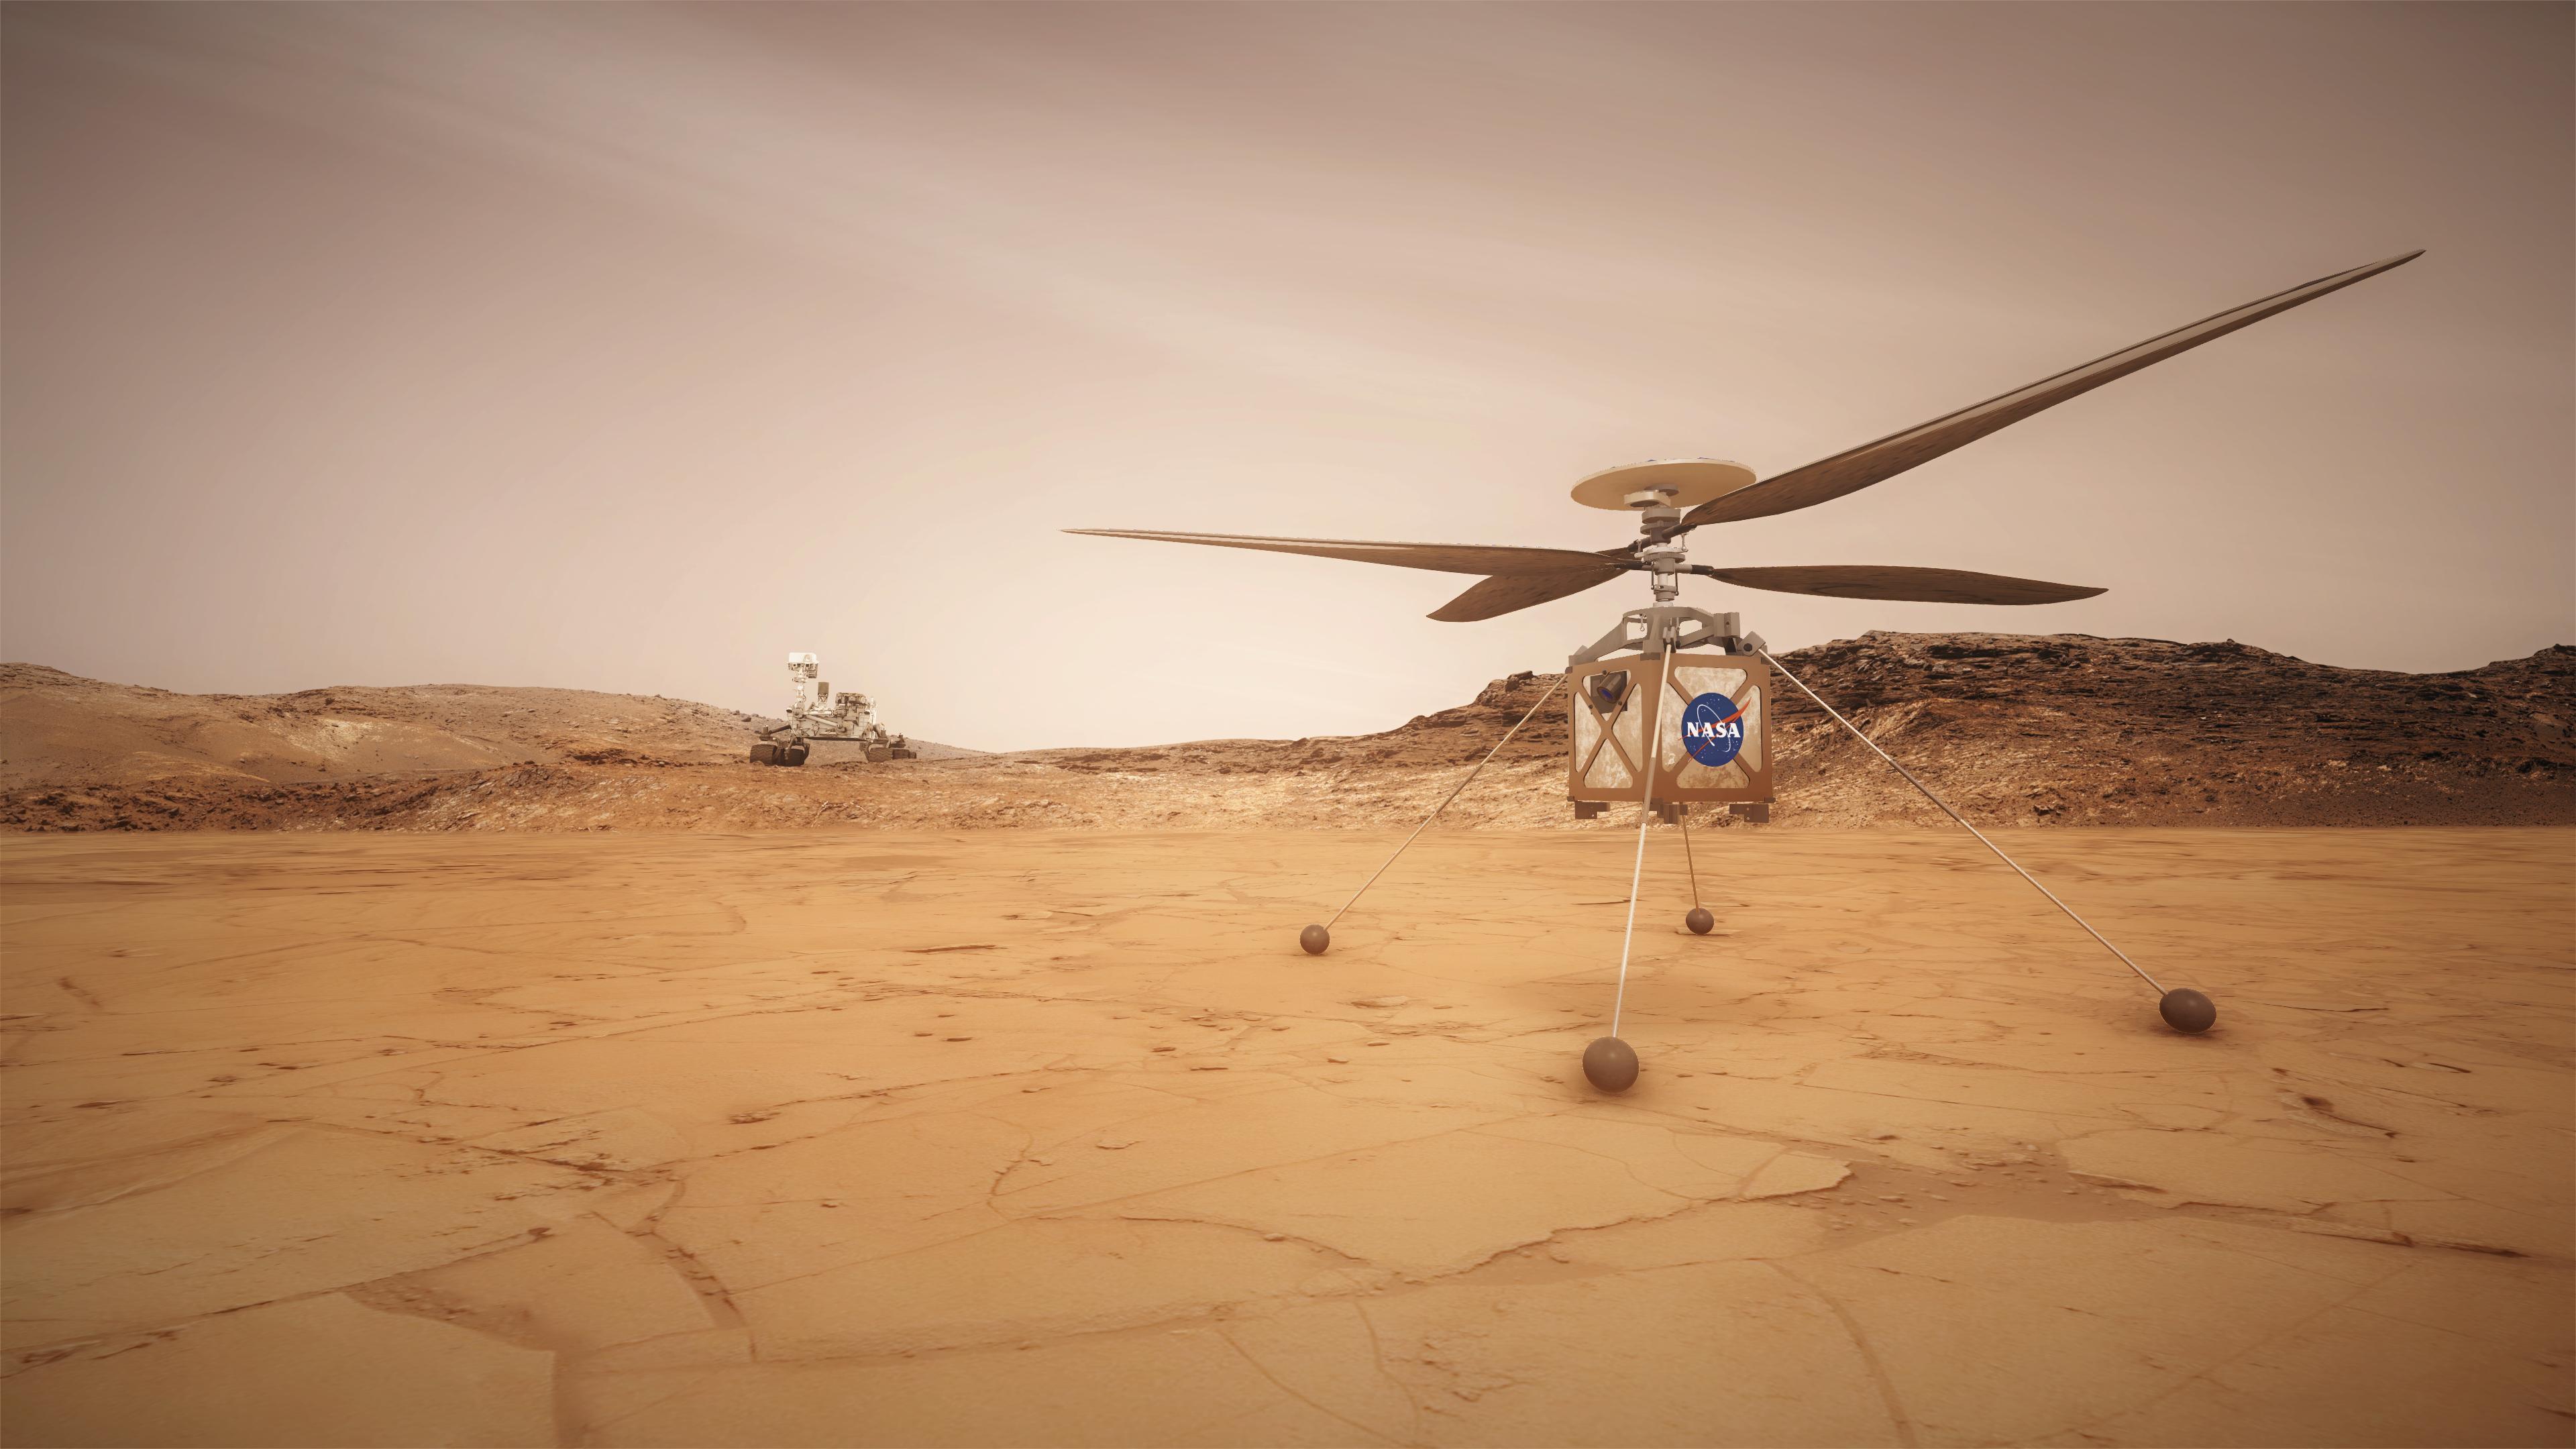 Mars 2020 Helicopter NASA